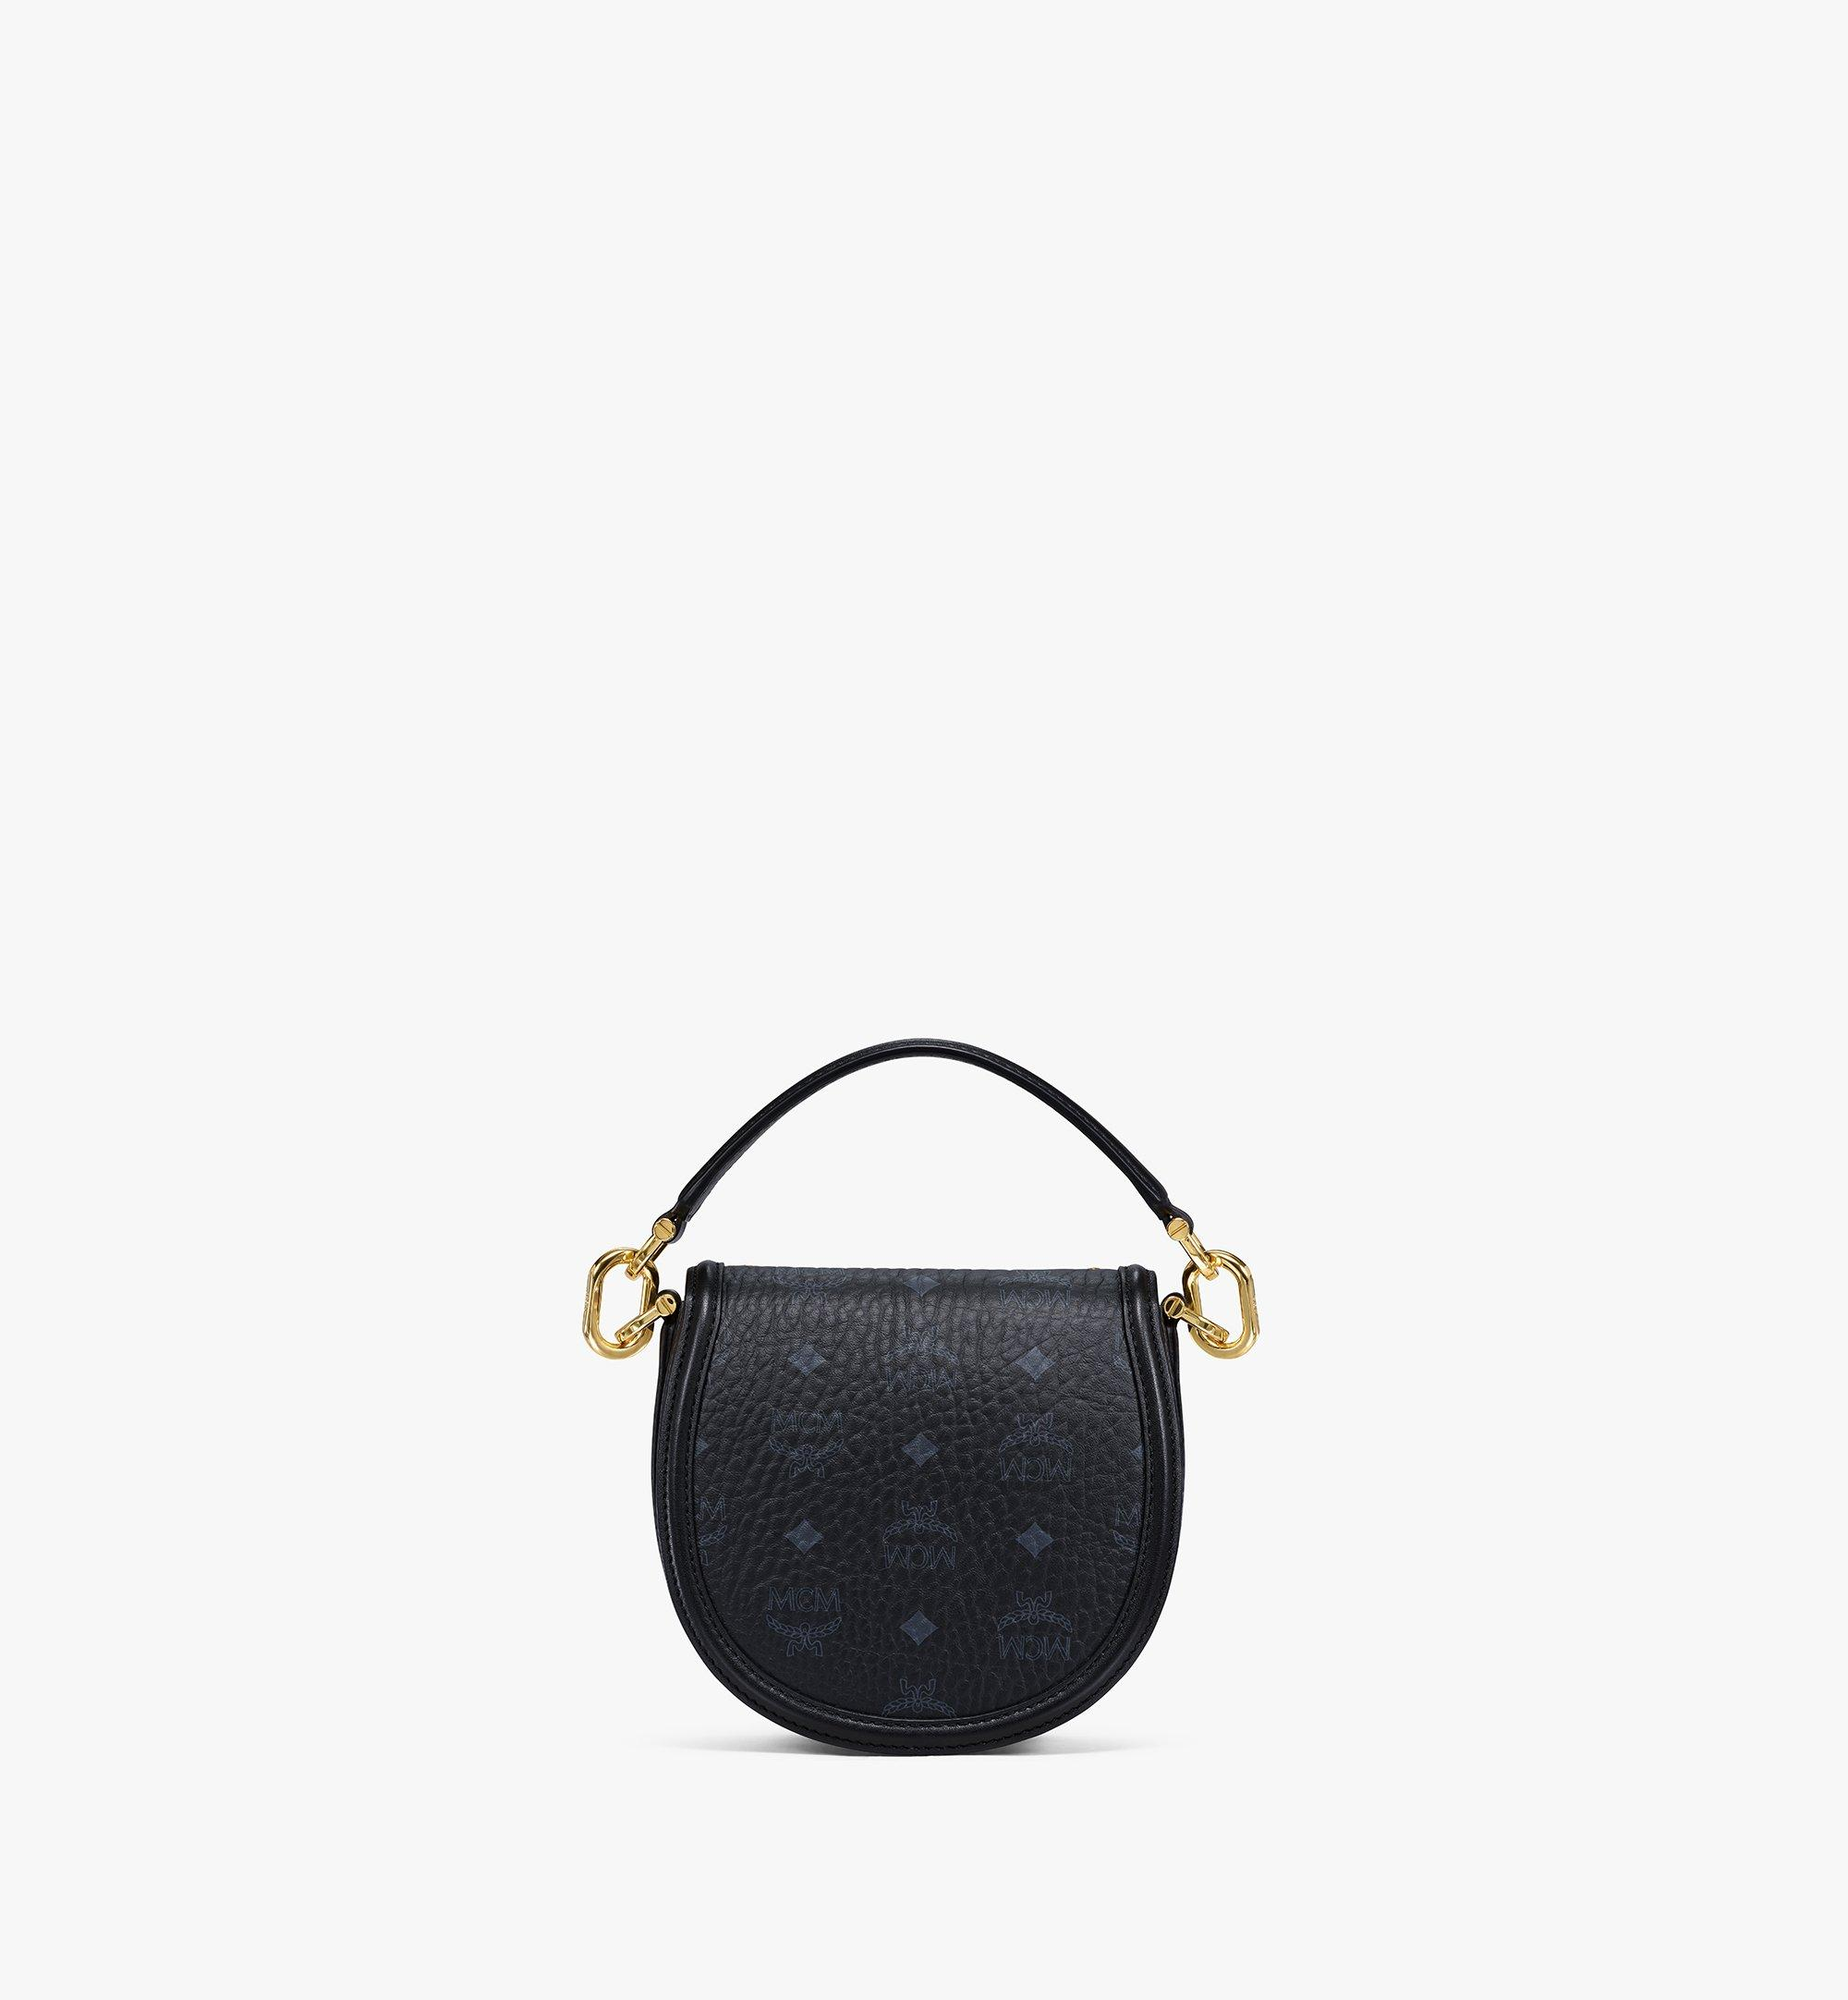 MCM Shoulder Bag in Crystal Visetos Black MWSBSVI01BK001 Alternate View 3